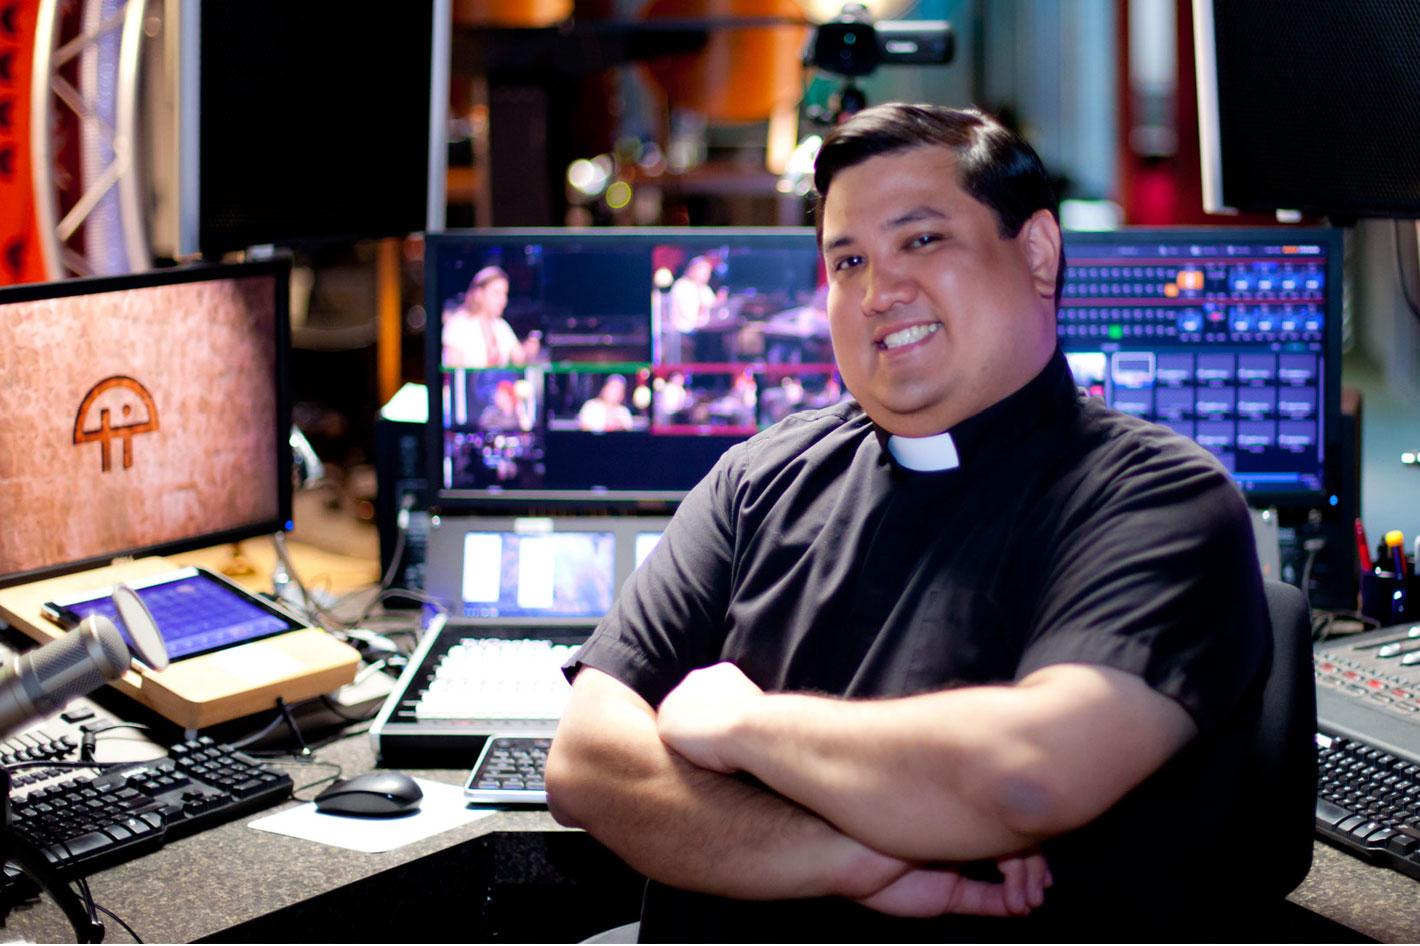 Catholic religious order streams with Blackmagic